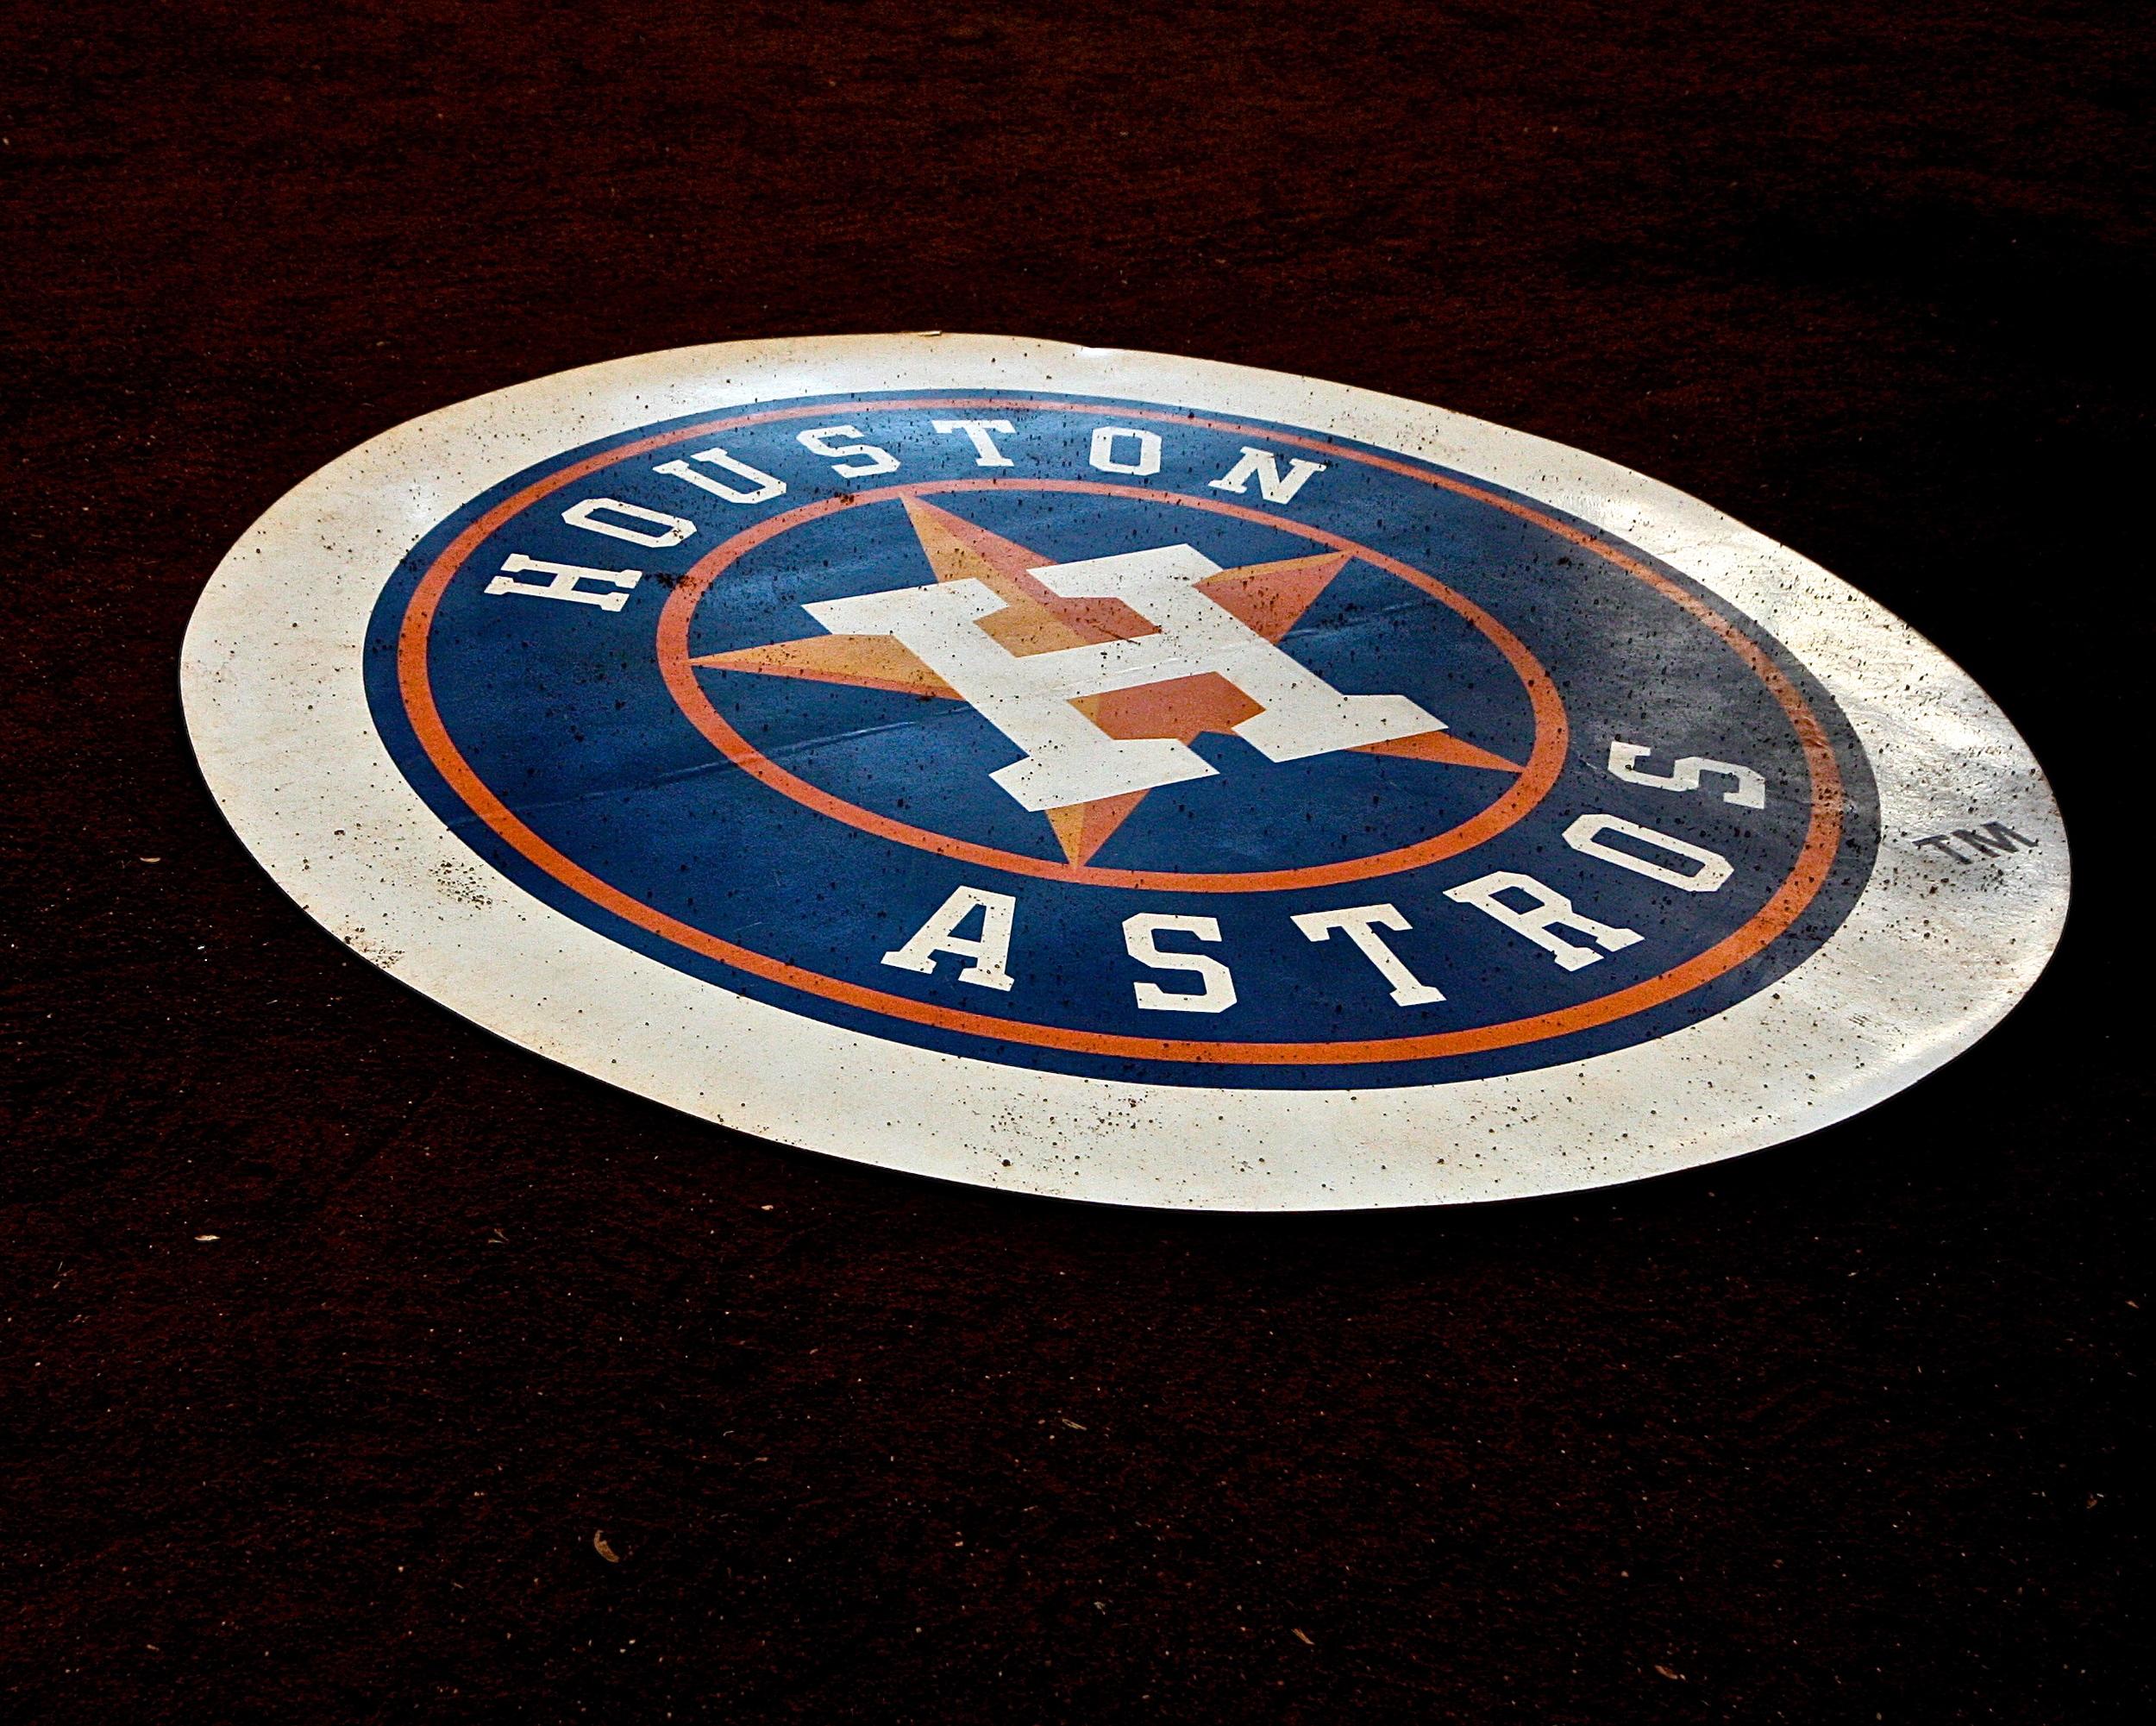 Astros on deck circle